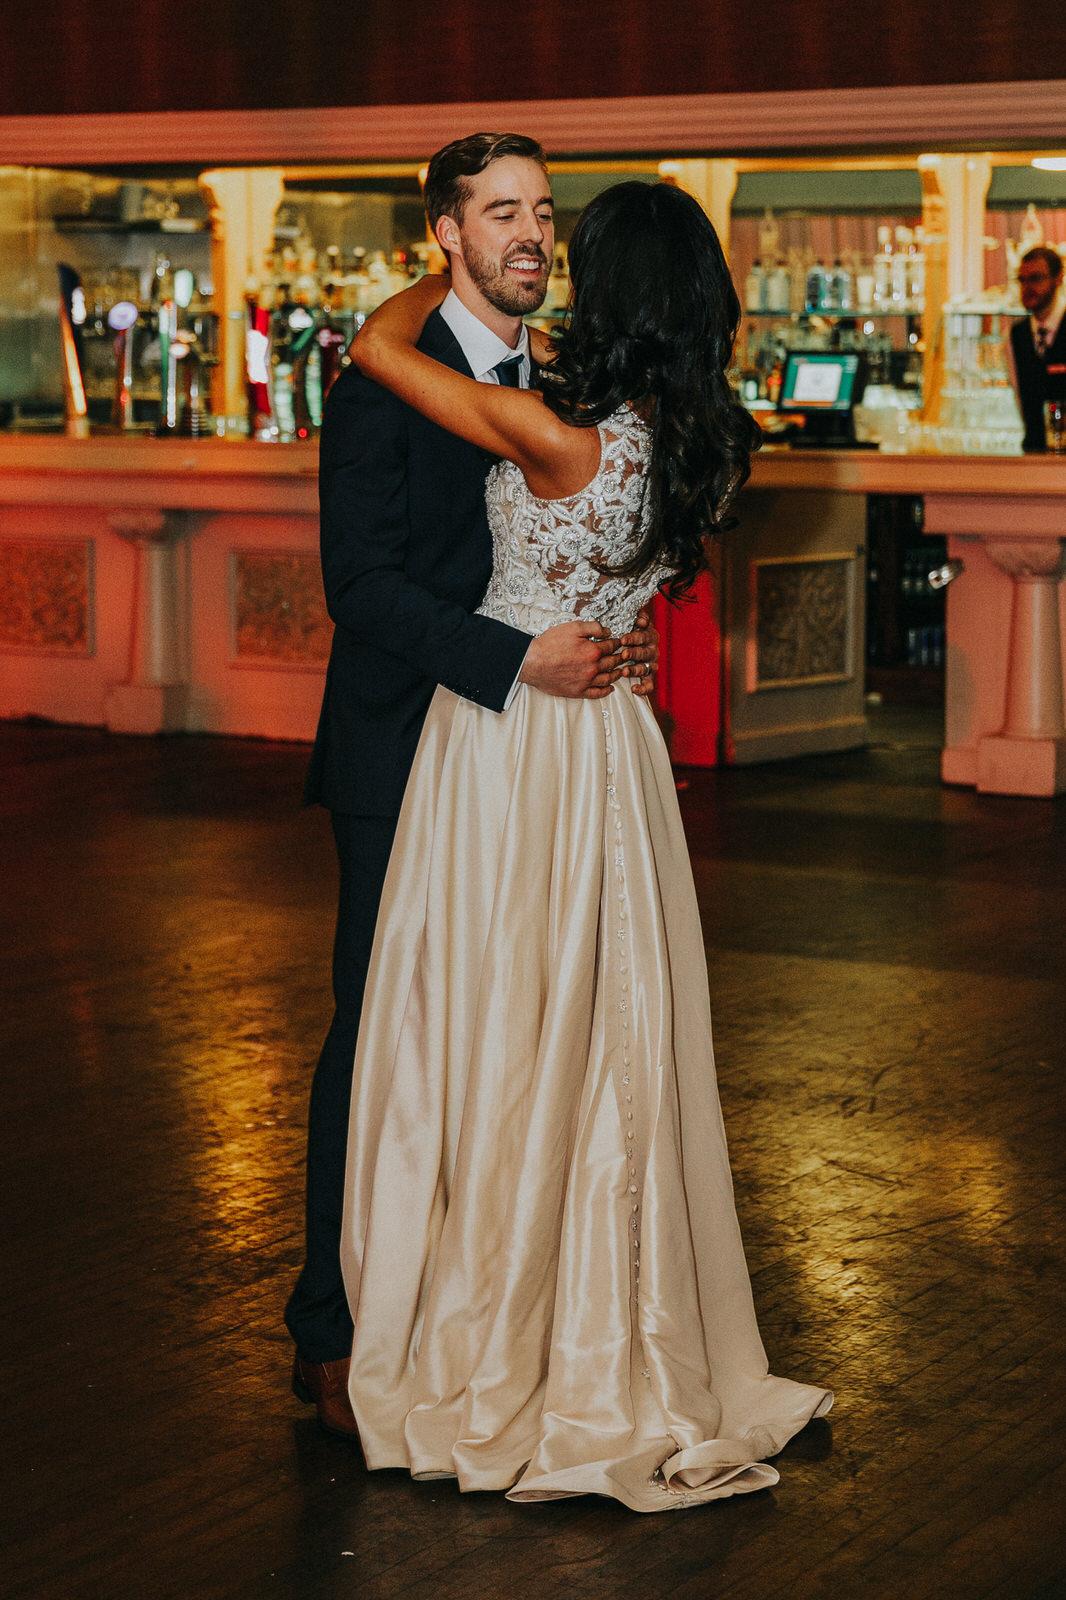 Roger_Kenny_wedding_photographer_514.jpg